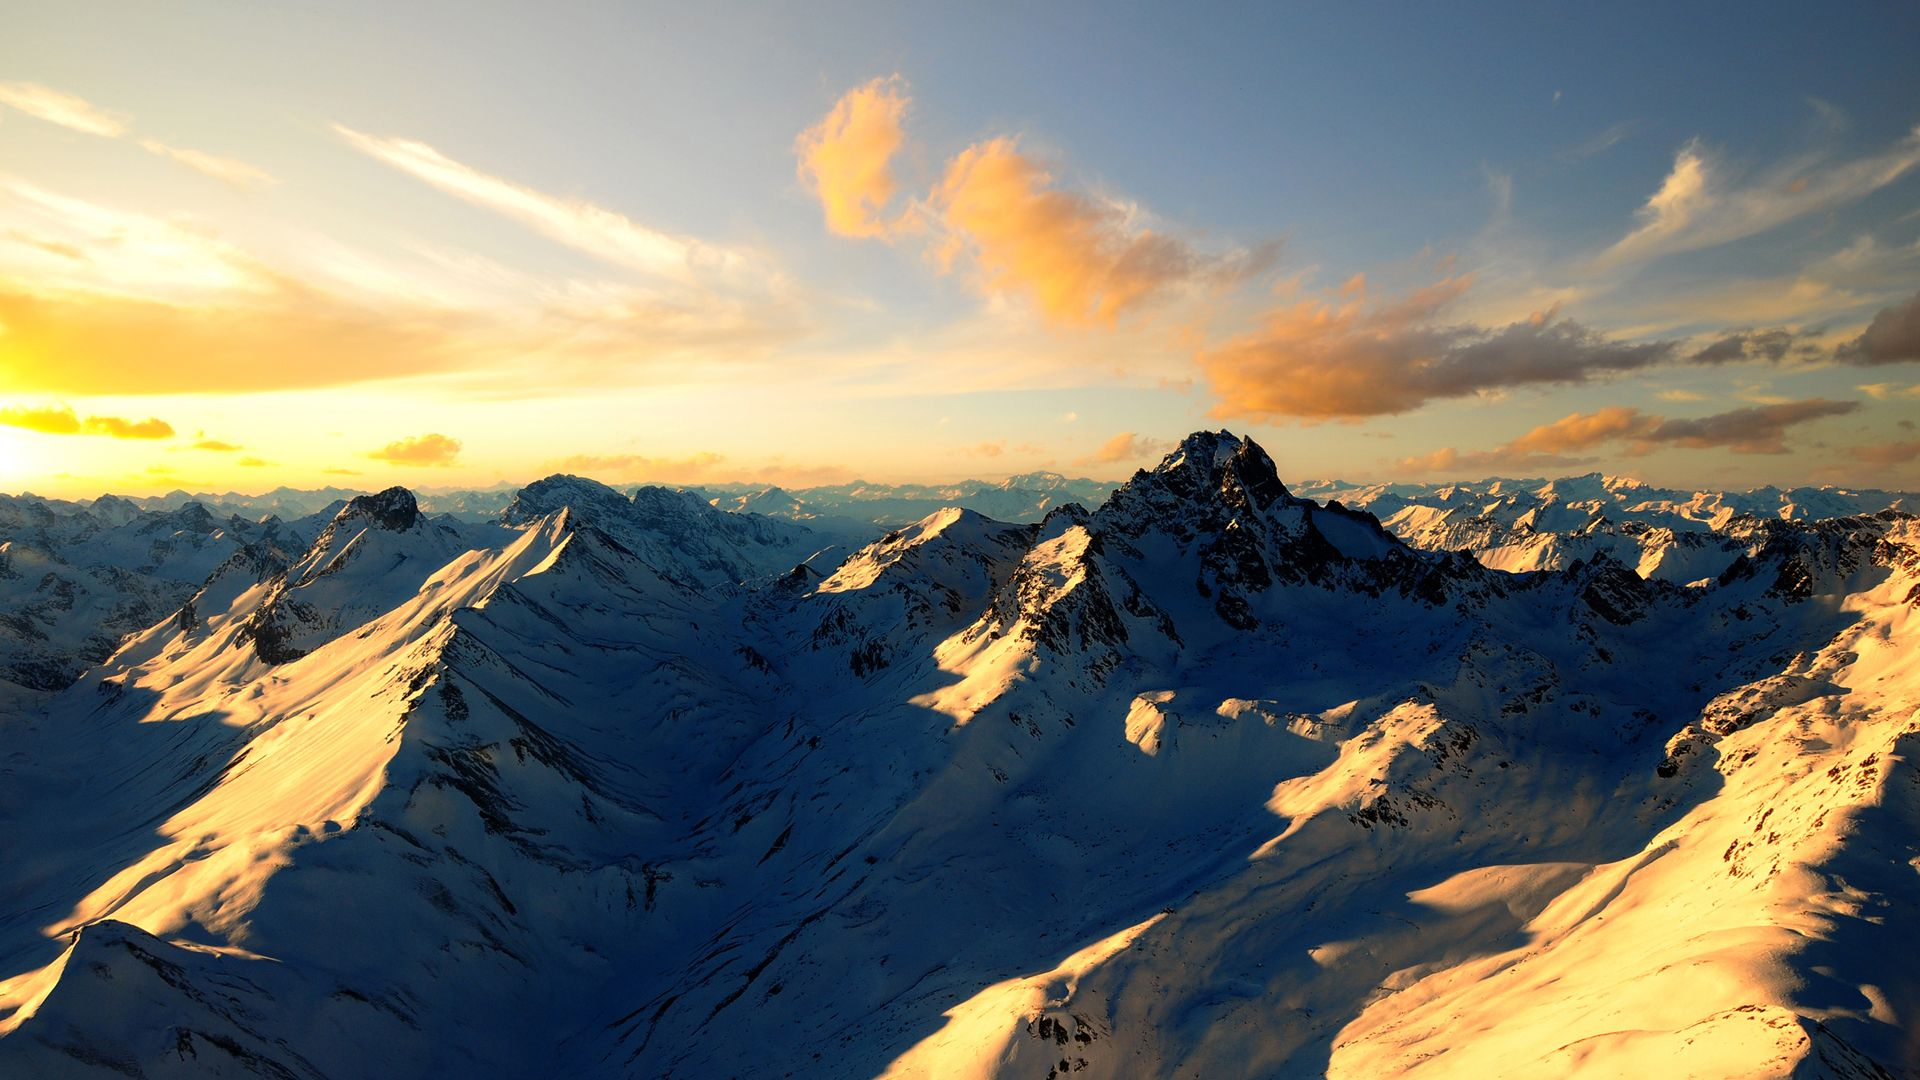 Snowy Mountain Sunset Background Wallpaper HD Resolution